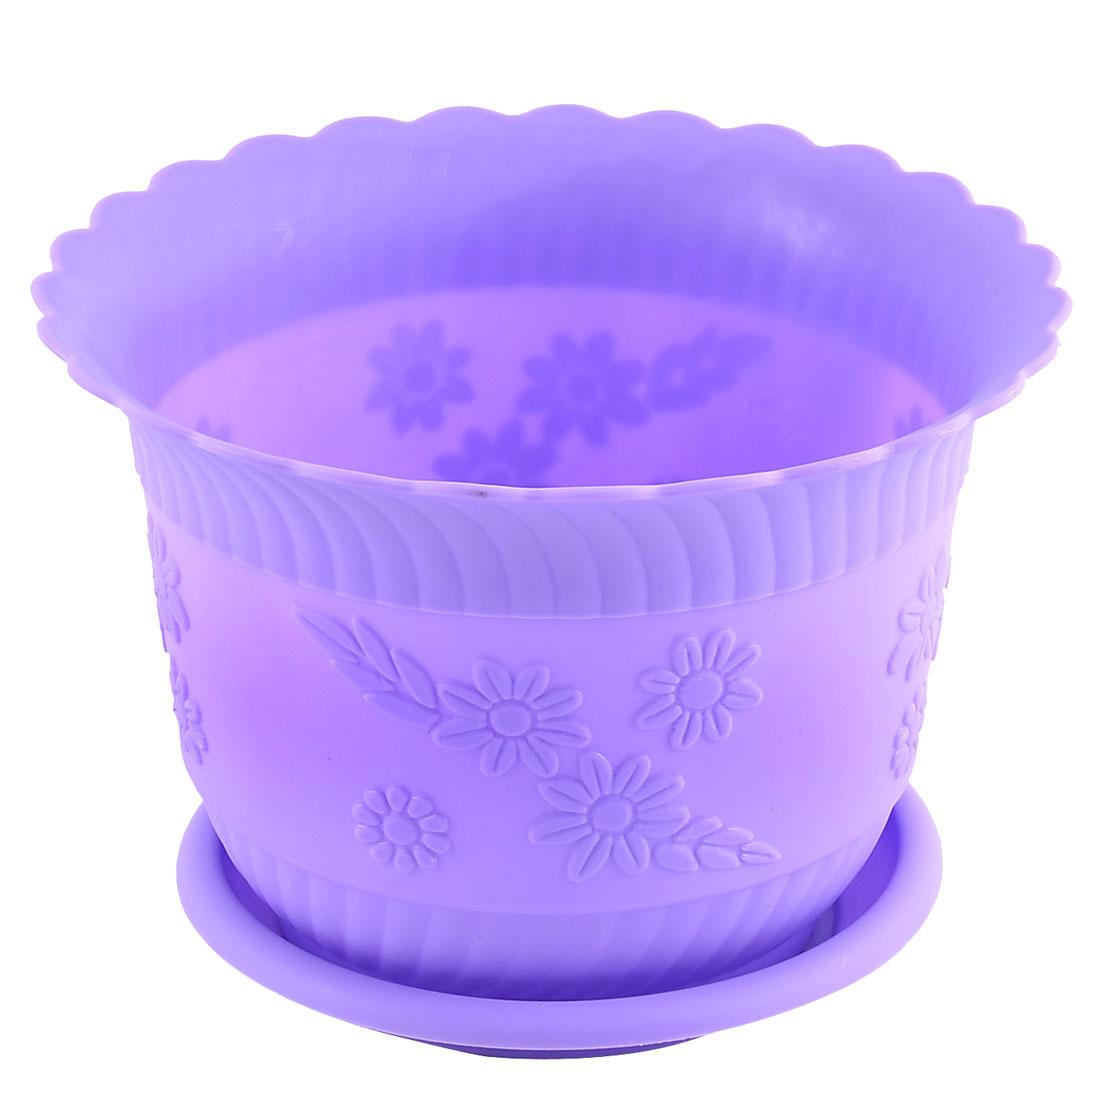 Home Office Garden Plastic Floral Pattern Plant Flower Pot Purple w Tray